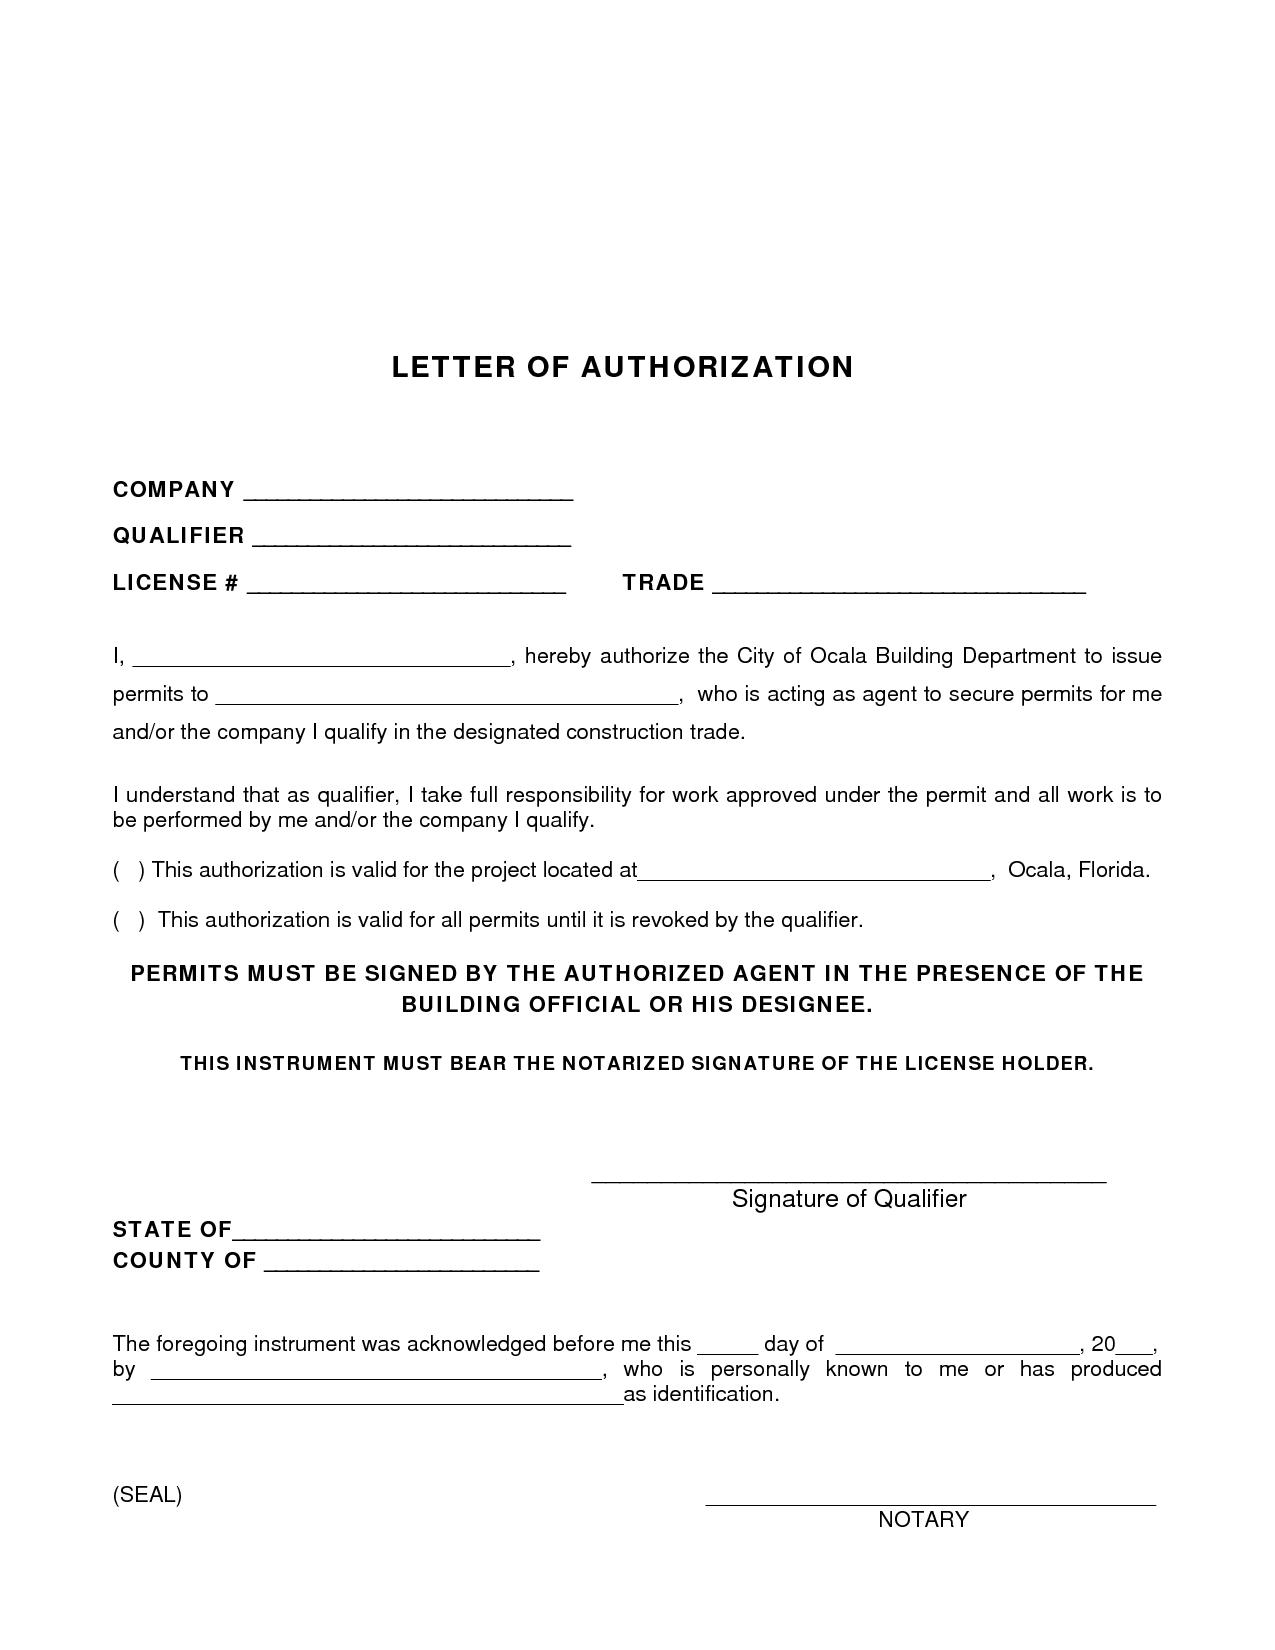 Authorization letter template datariouruguay altavistaventures Choice Image